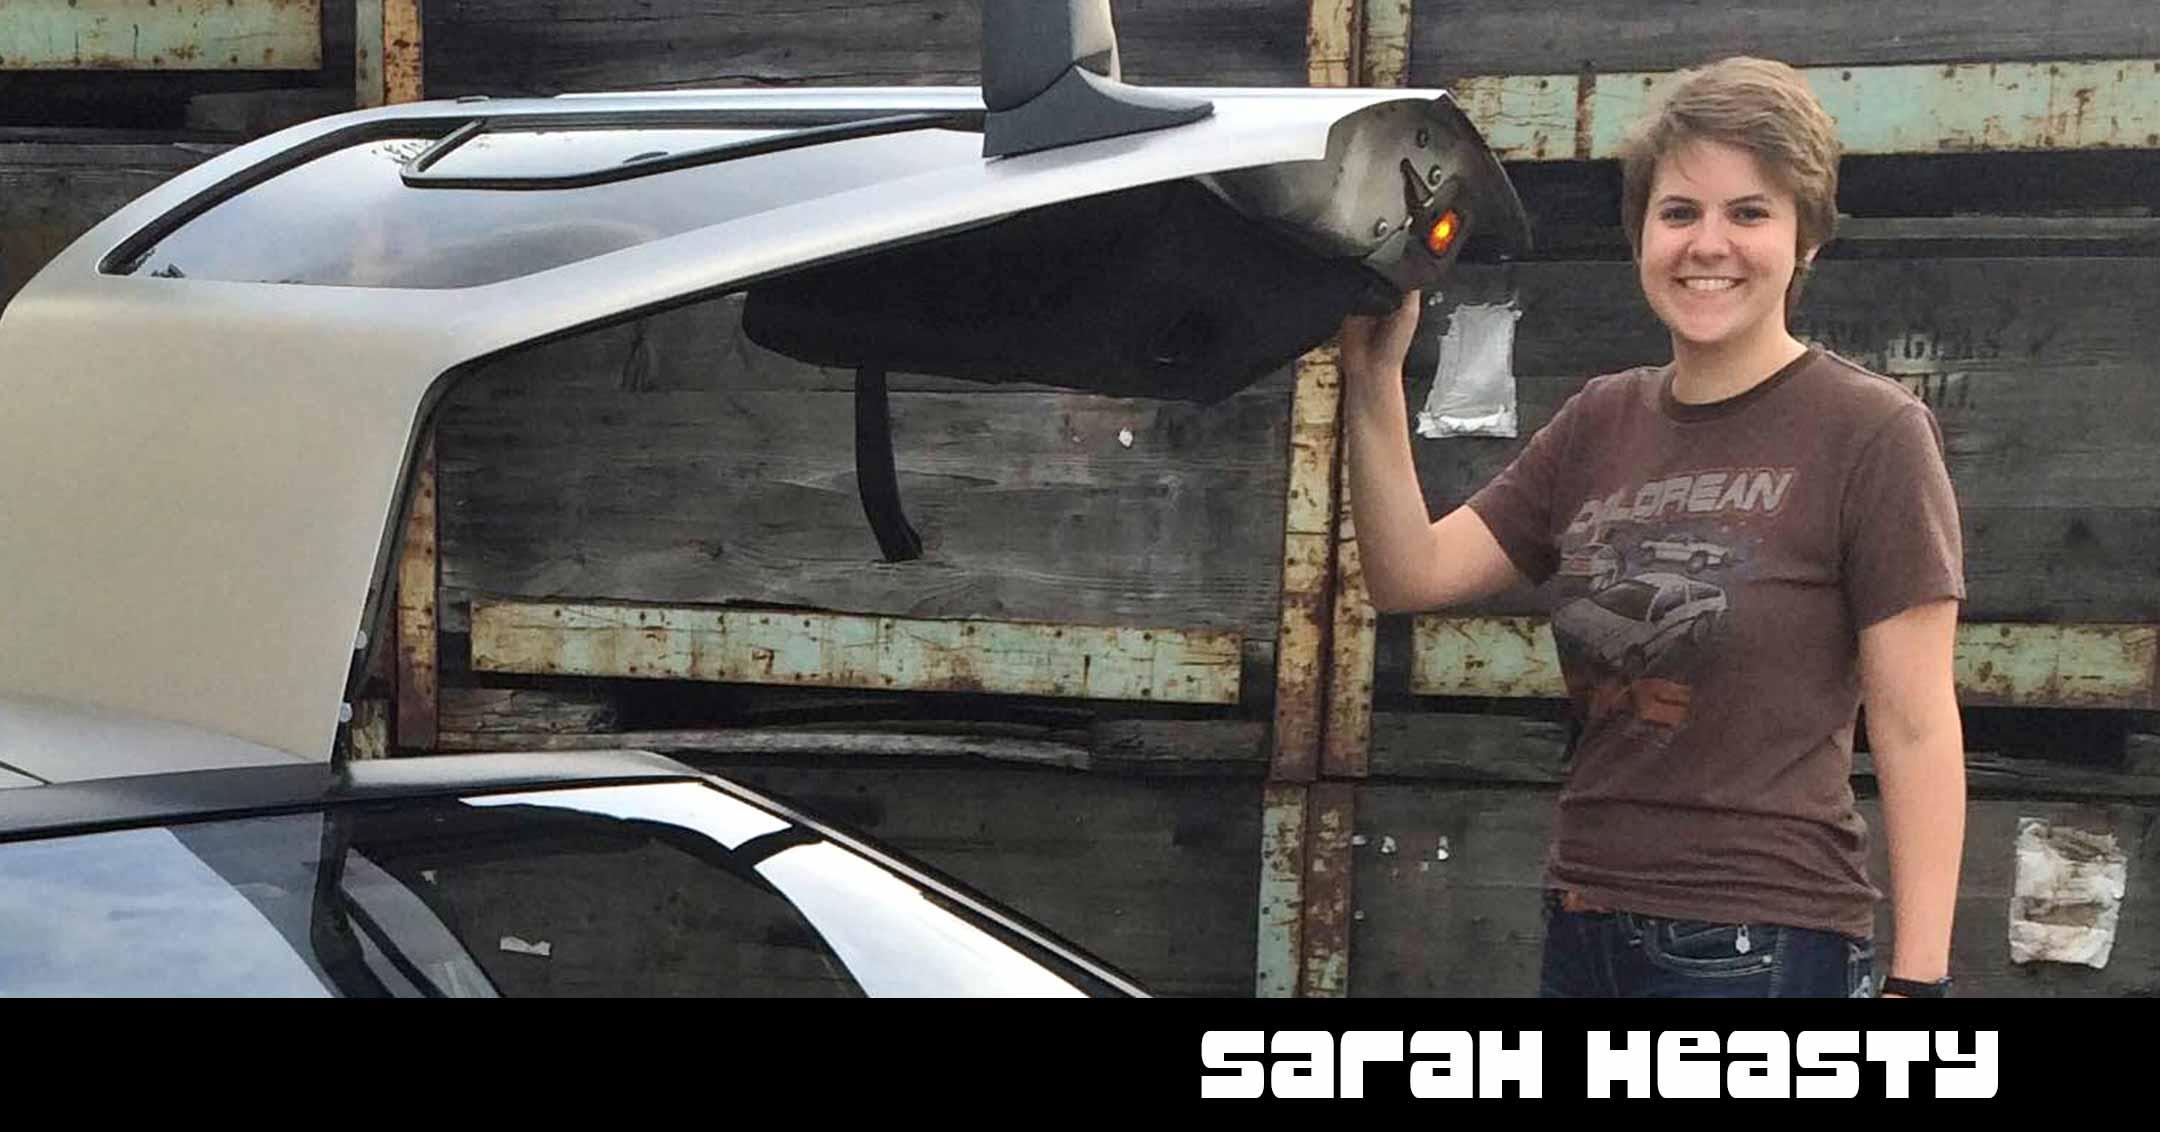 007 – Sarah Heasty